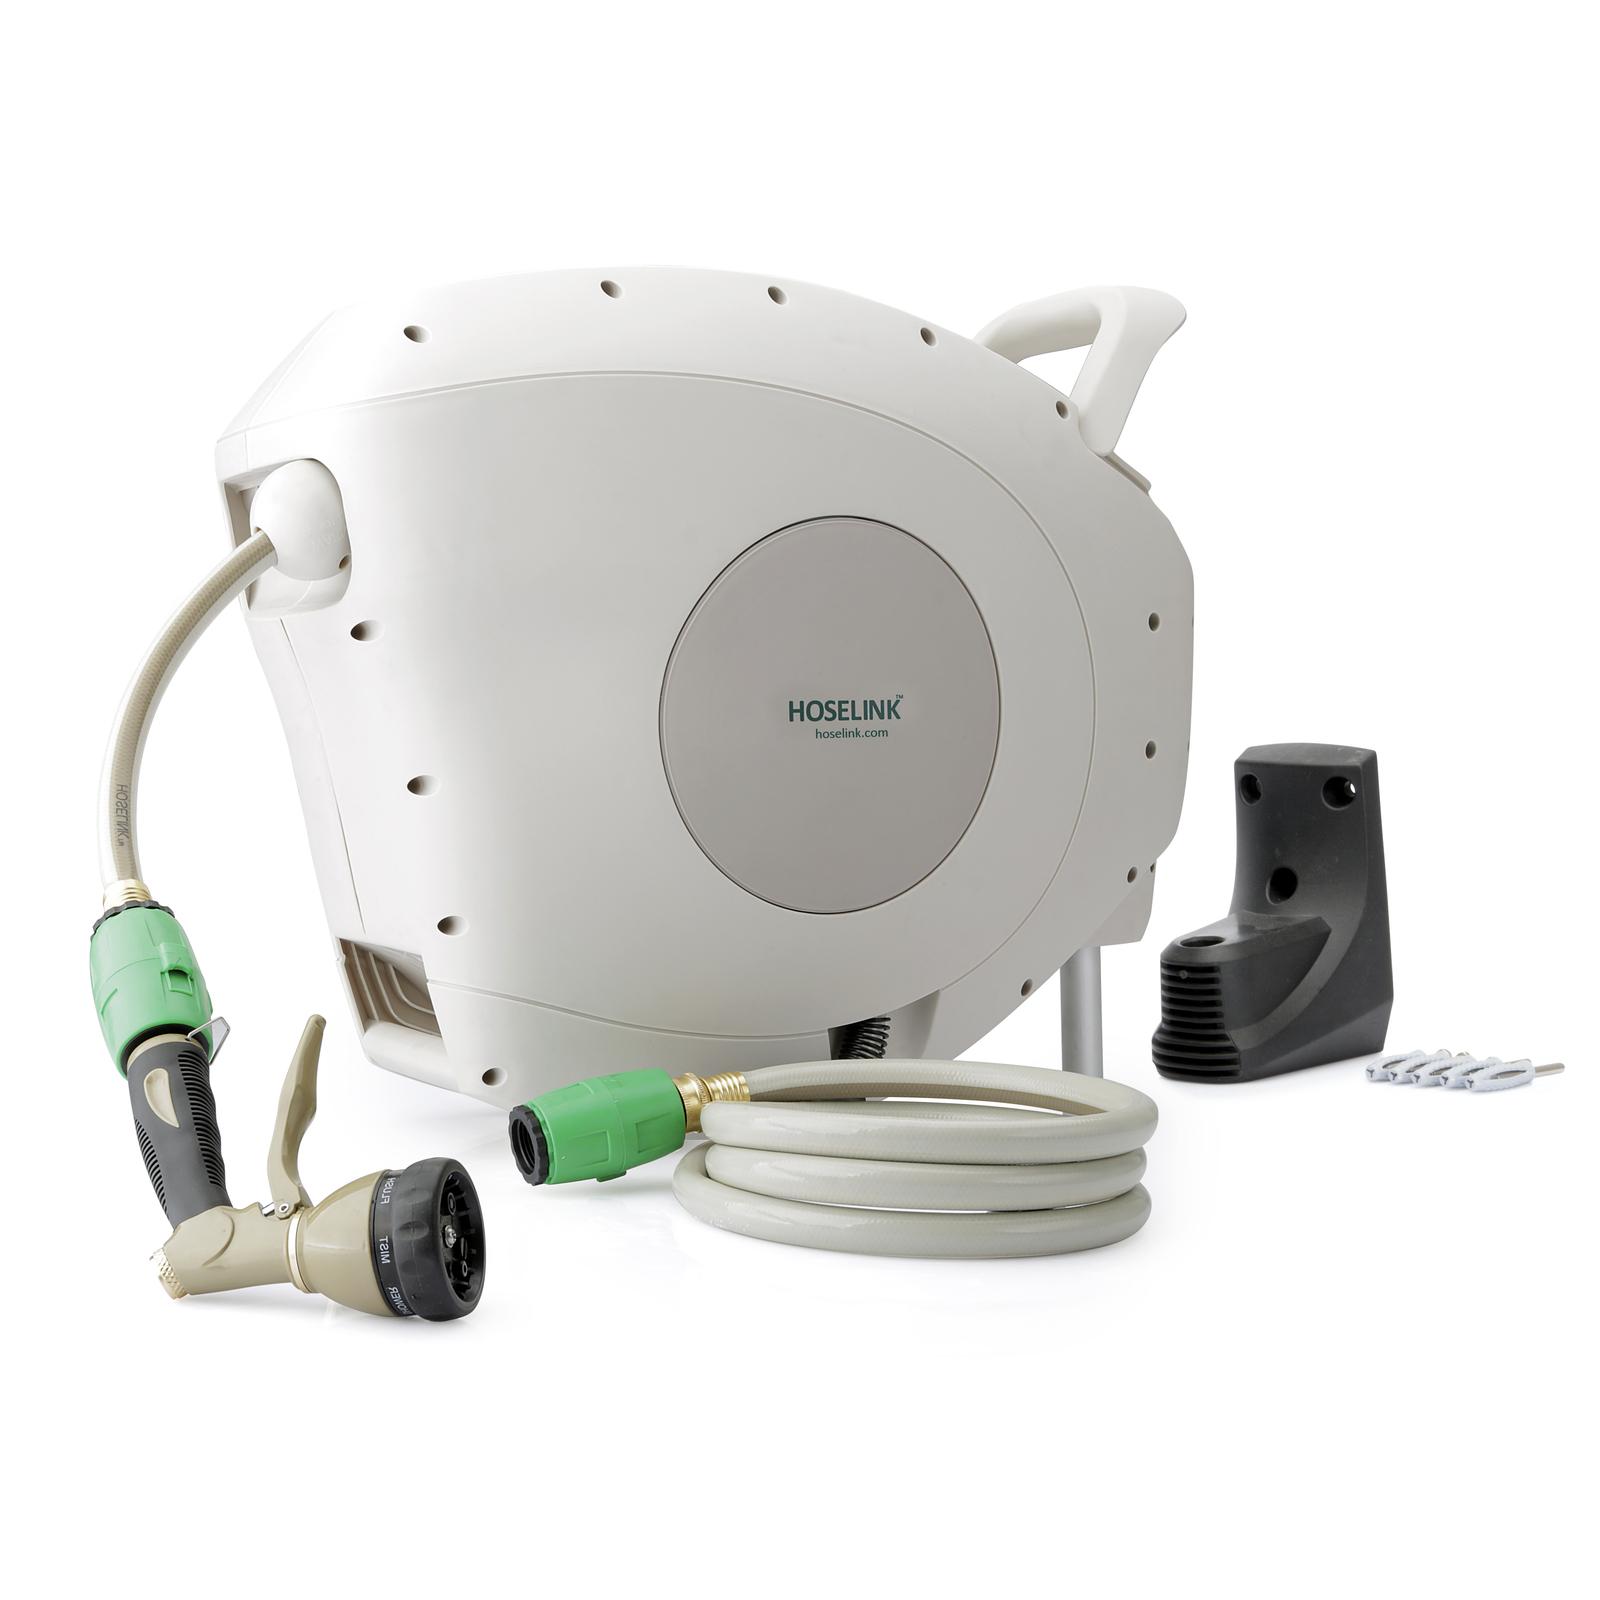 DISCONTINUED 2019 HoseLink Retractable Garden Hose Reel with 7 Function Spray Nozzle (82 Ft)